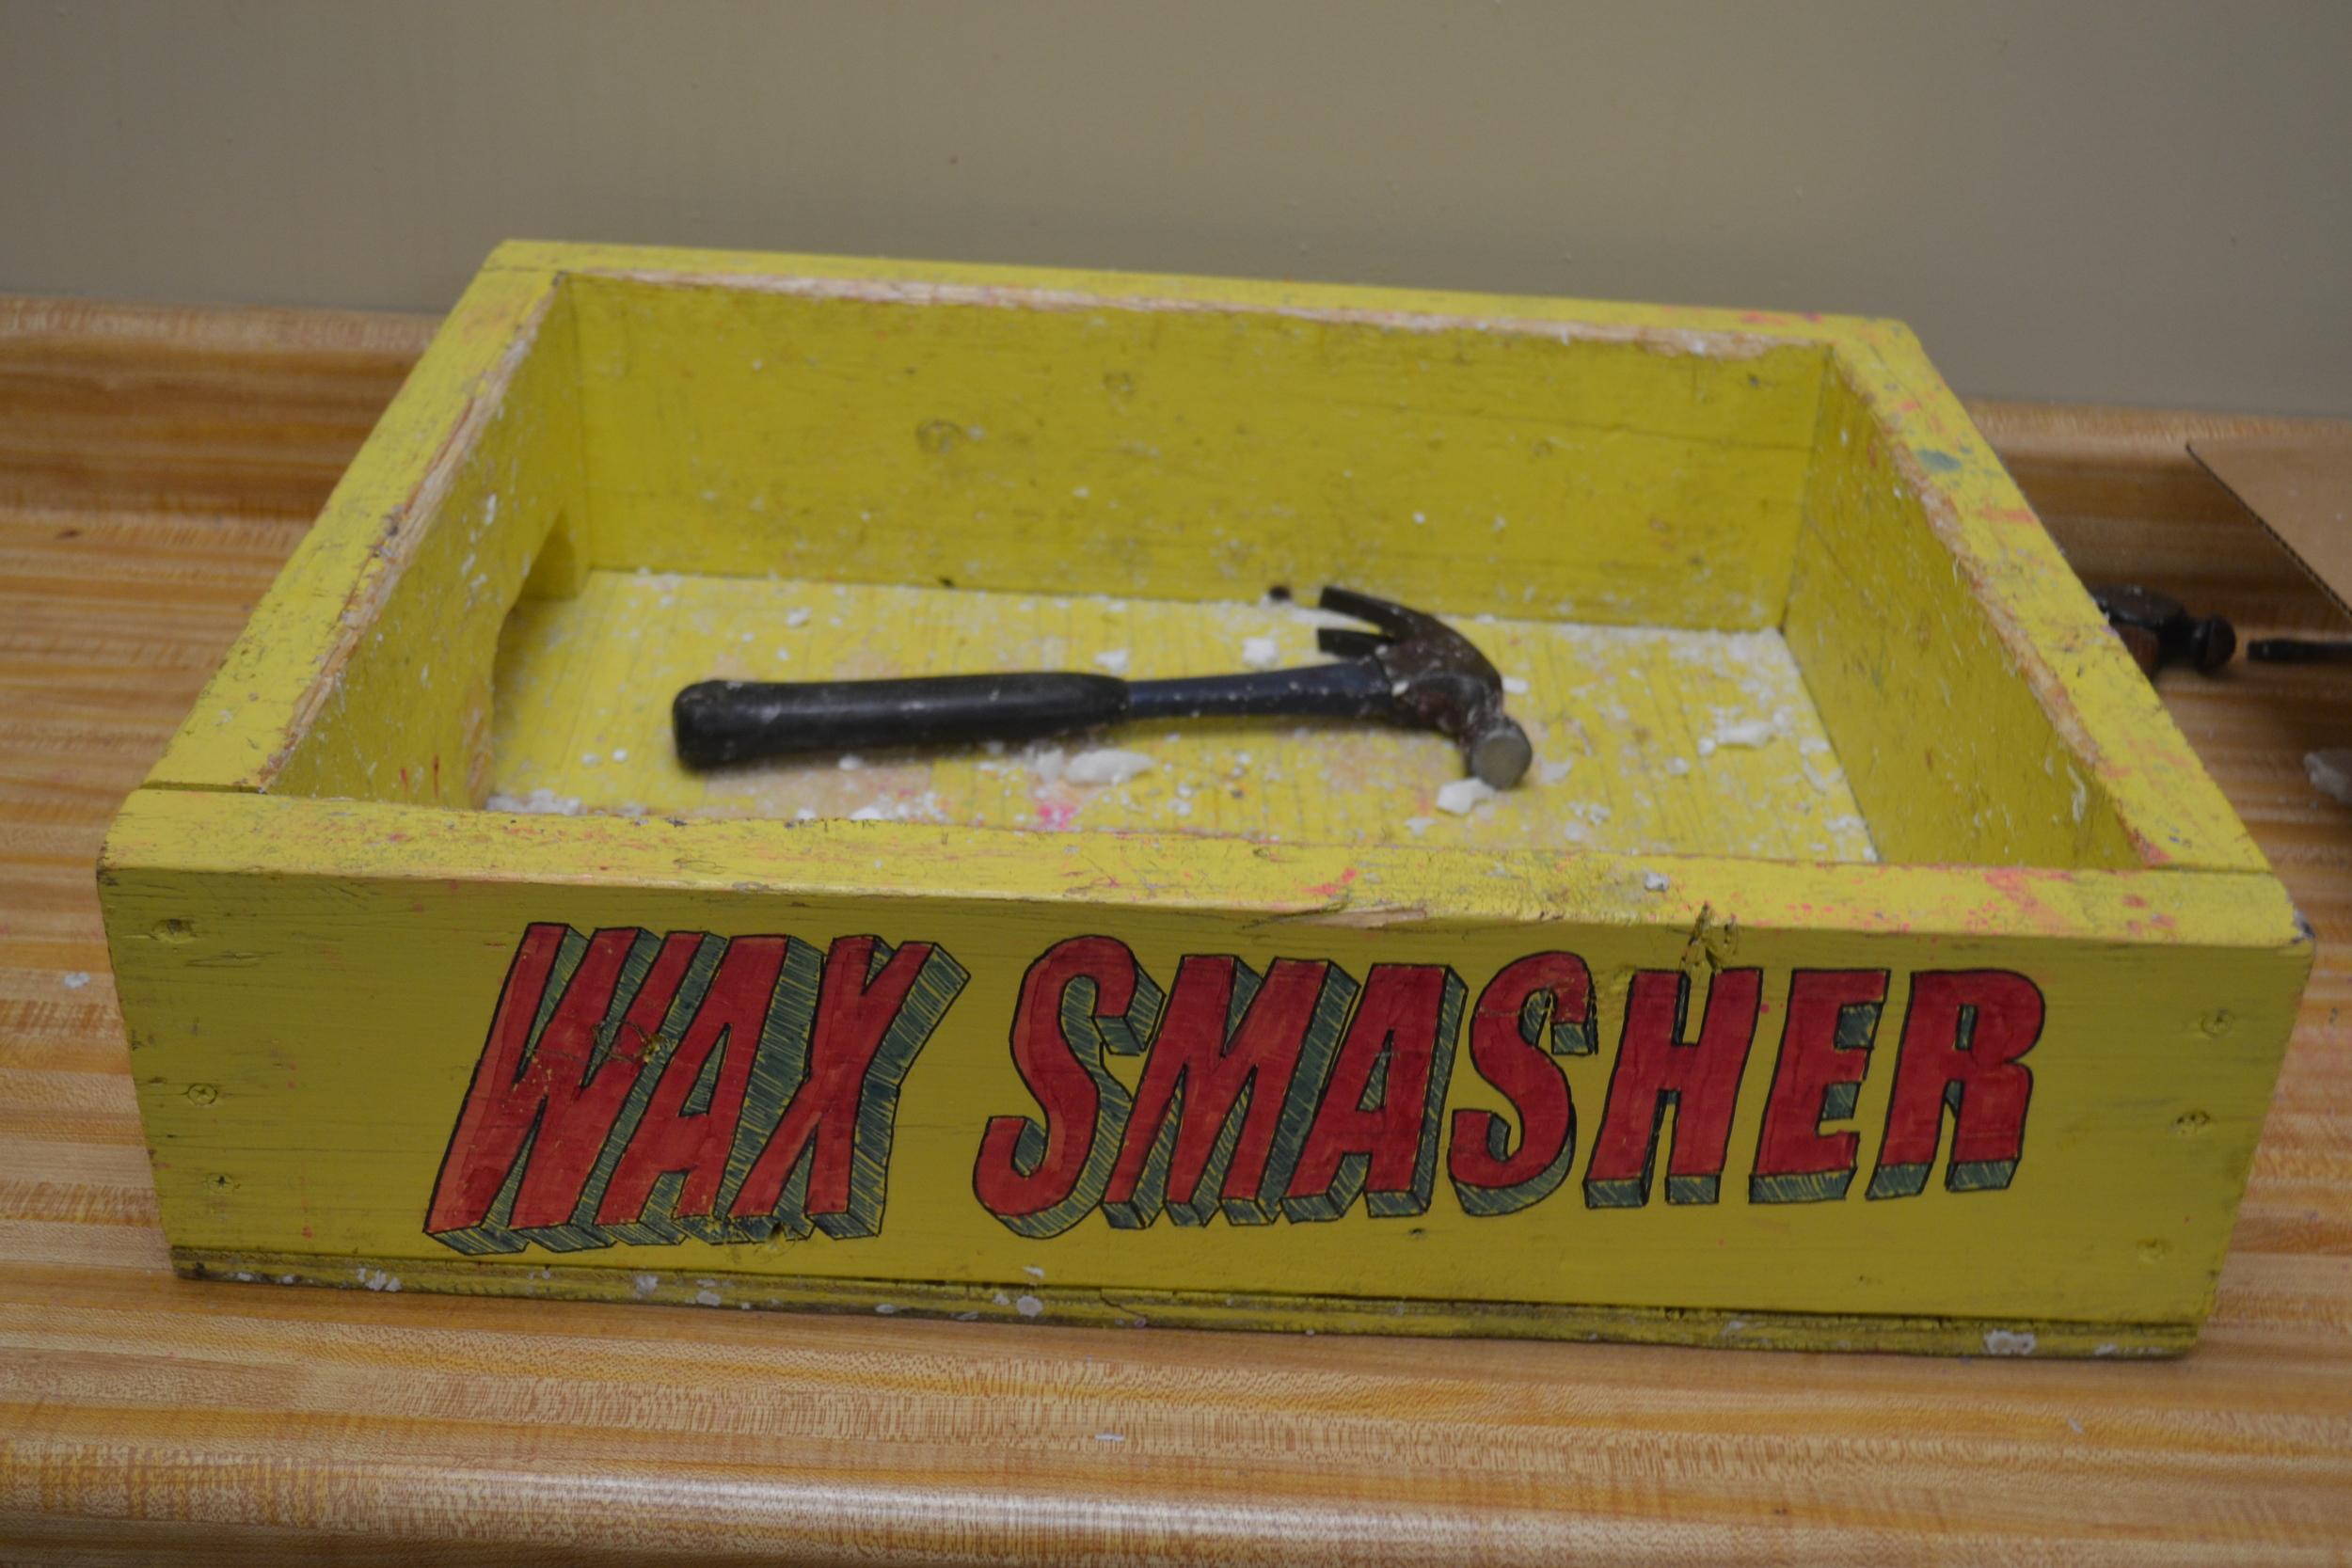 Wax Smasher Camp Jewell